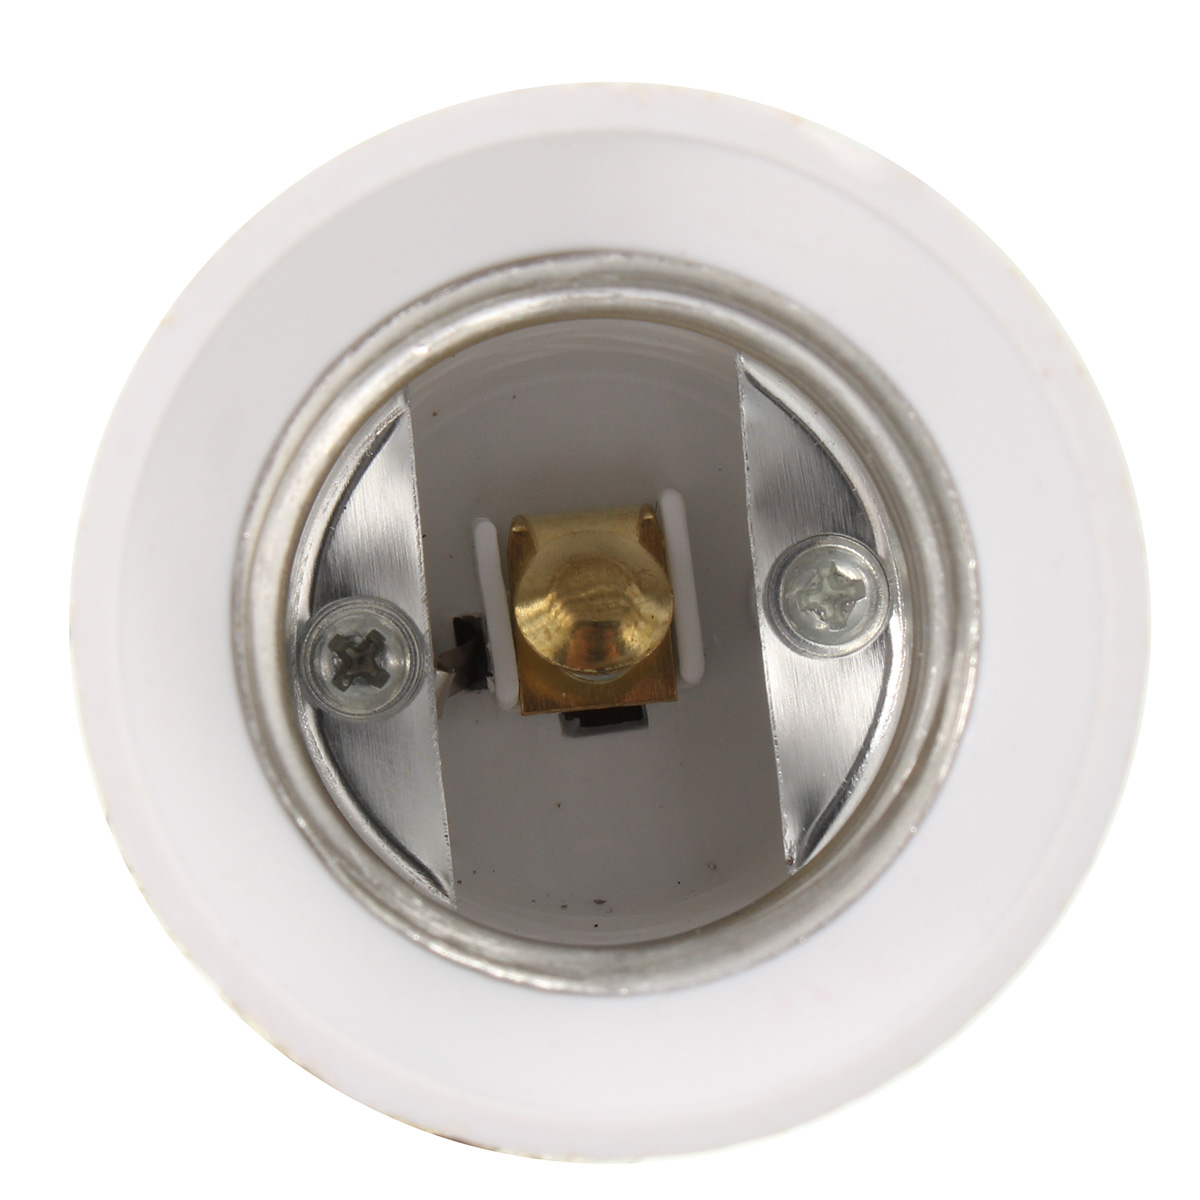 US Plug to E27 LED Light Lamp Bulbs Wall Socket Base Adapter Converter Switch Lazada PH